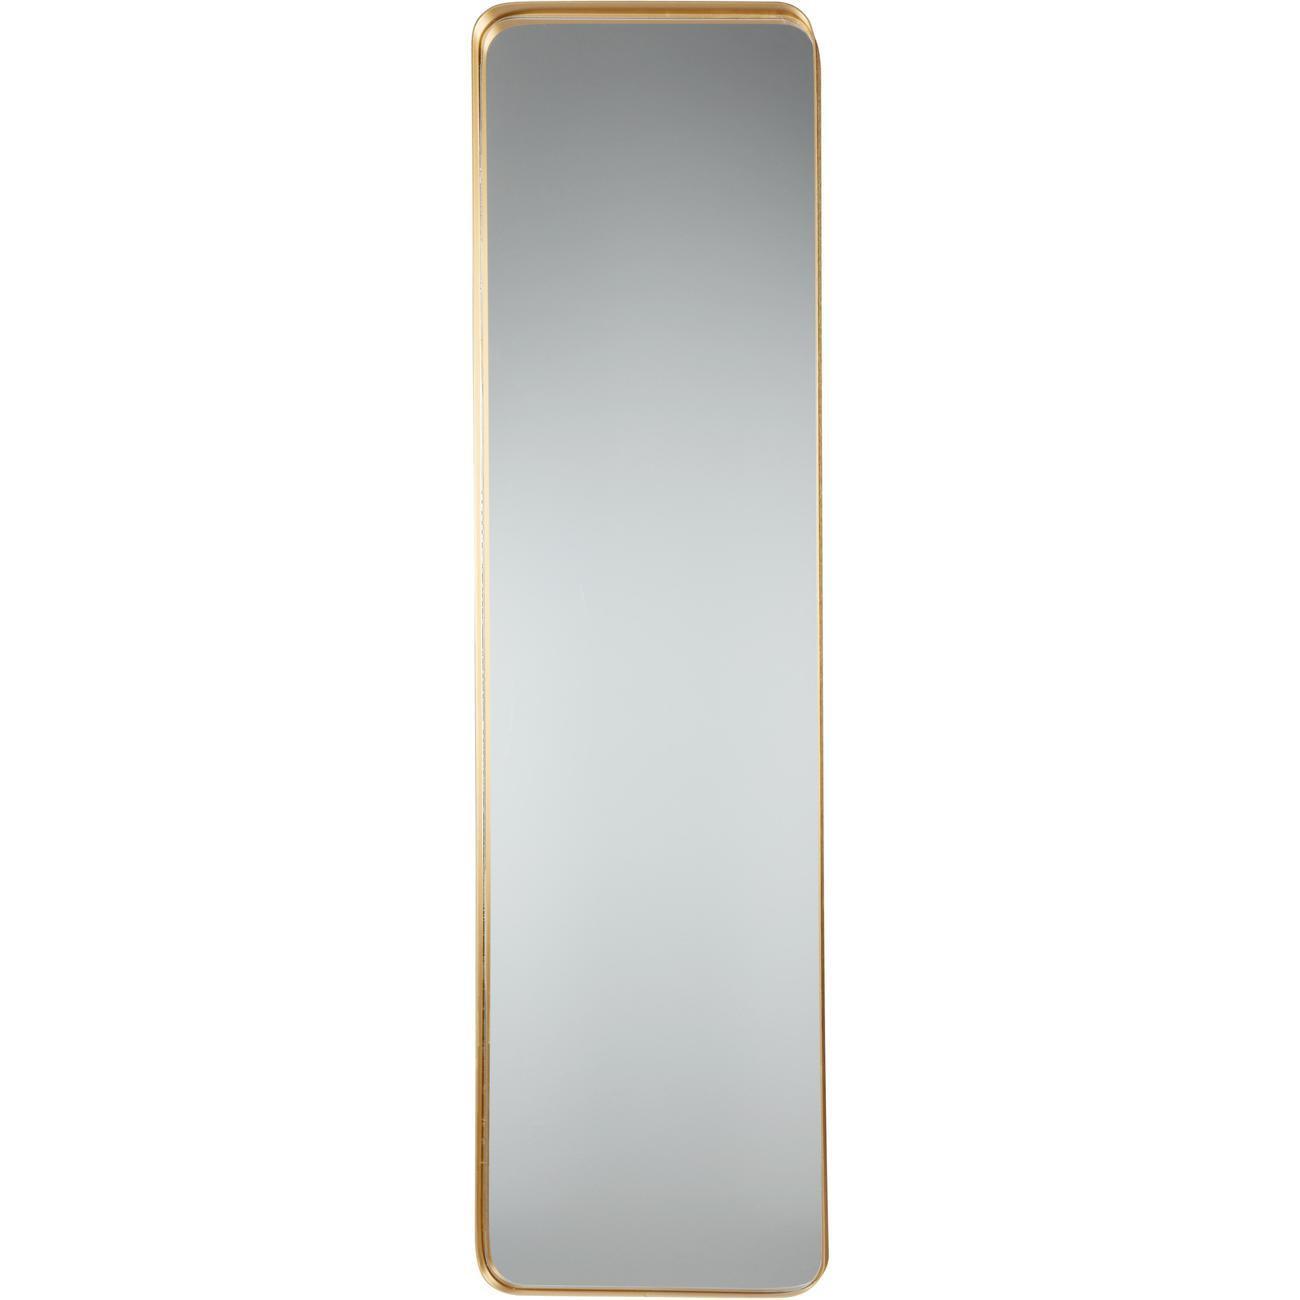 Miroir et tendance de forme rectangulairee en aluminium Stern1